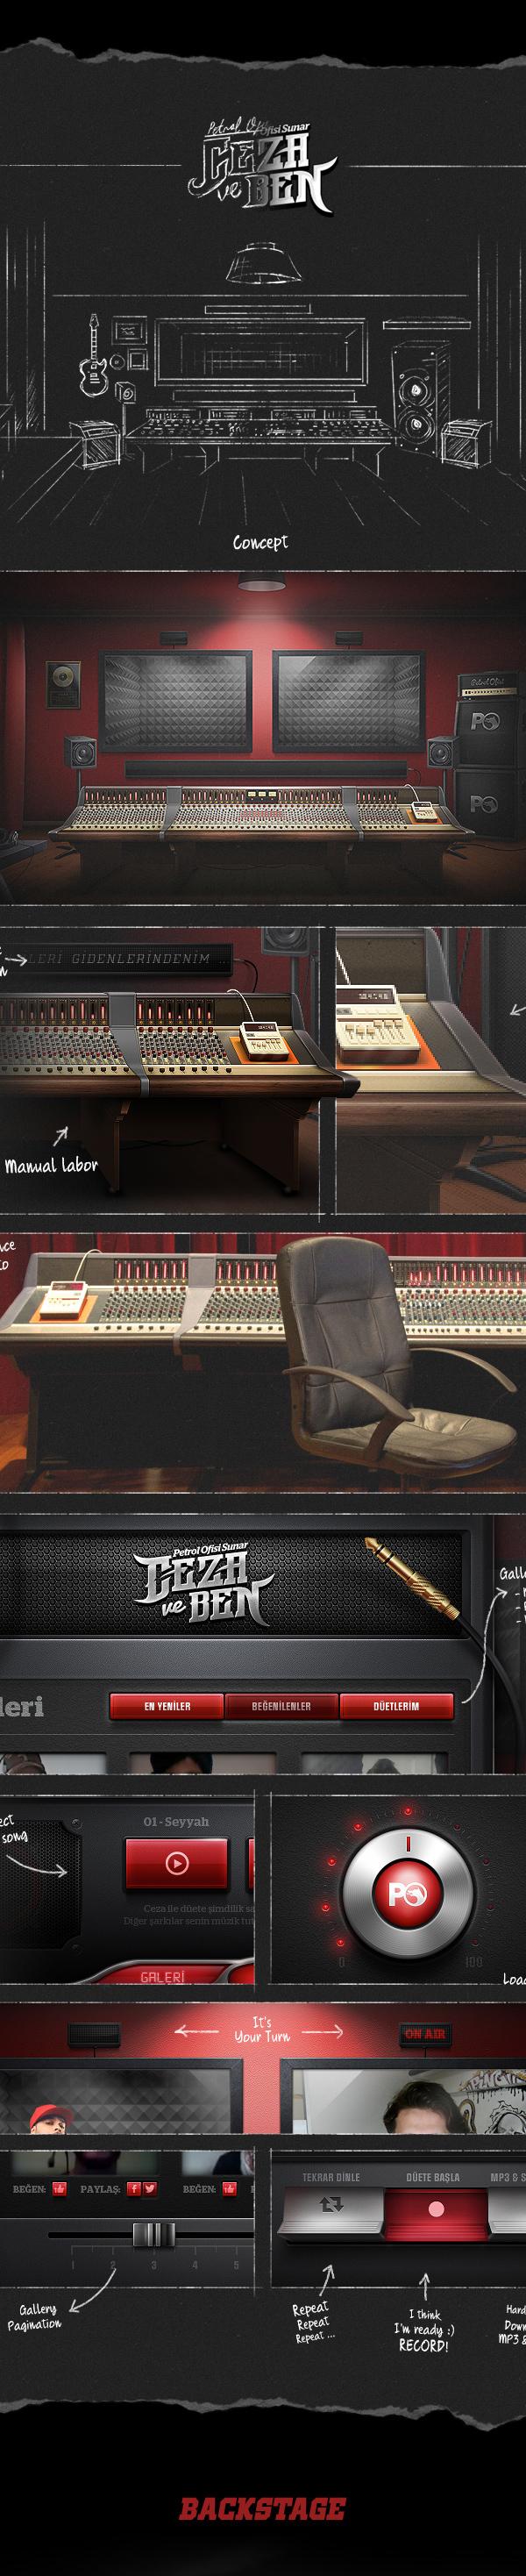 ceza  studio record rap hiphop petrol ofisi petrol ofisi duet featuring feat Music Studio